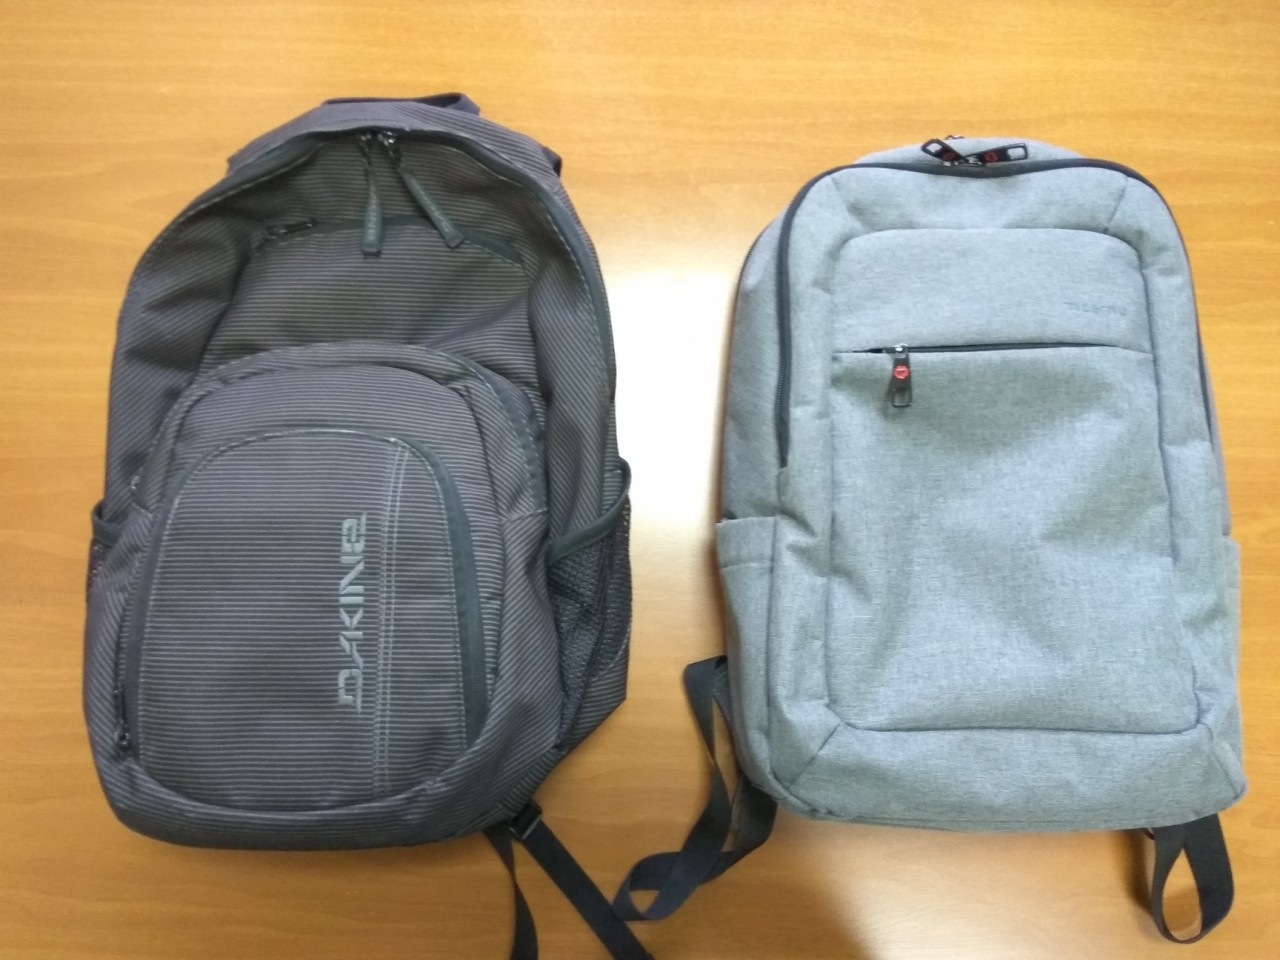 Рюкзаки из гуанчжоу рюкзак следопыт 80 габариты